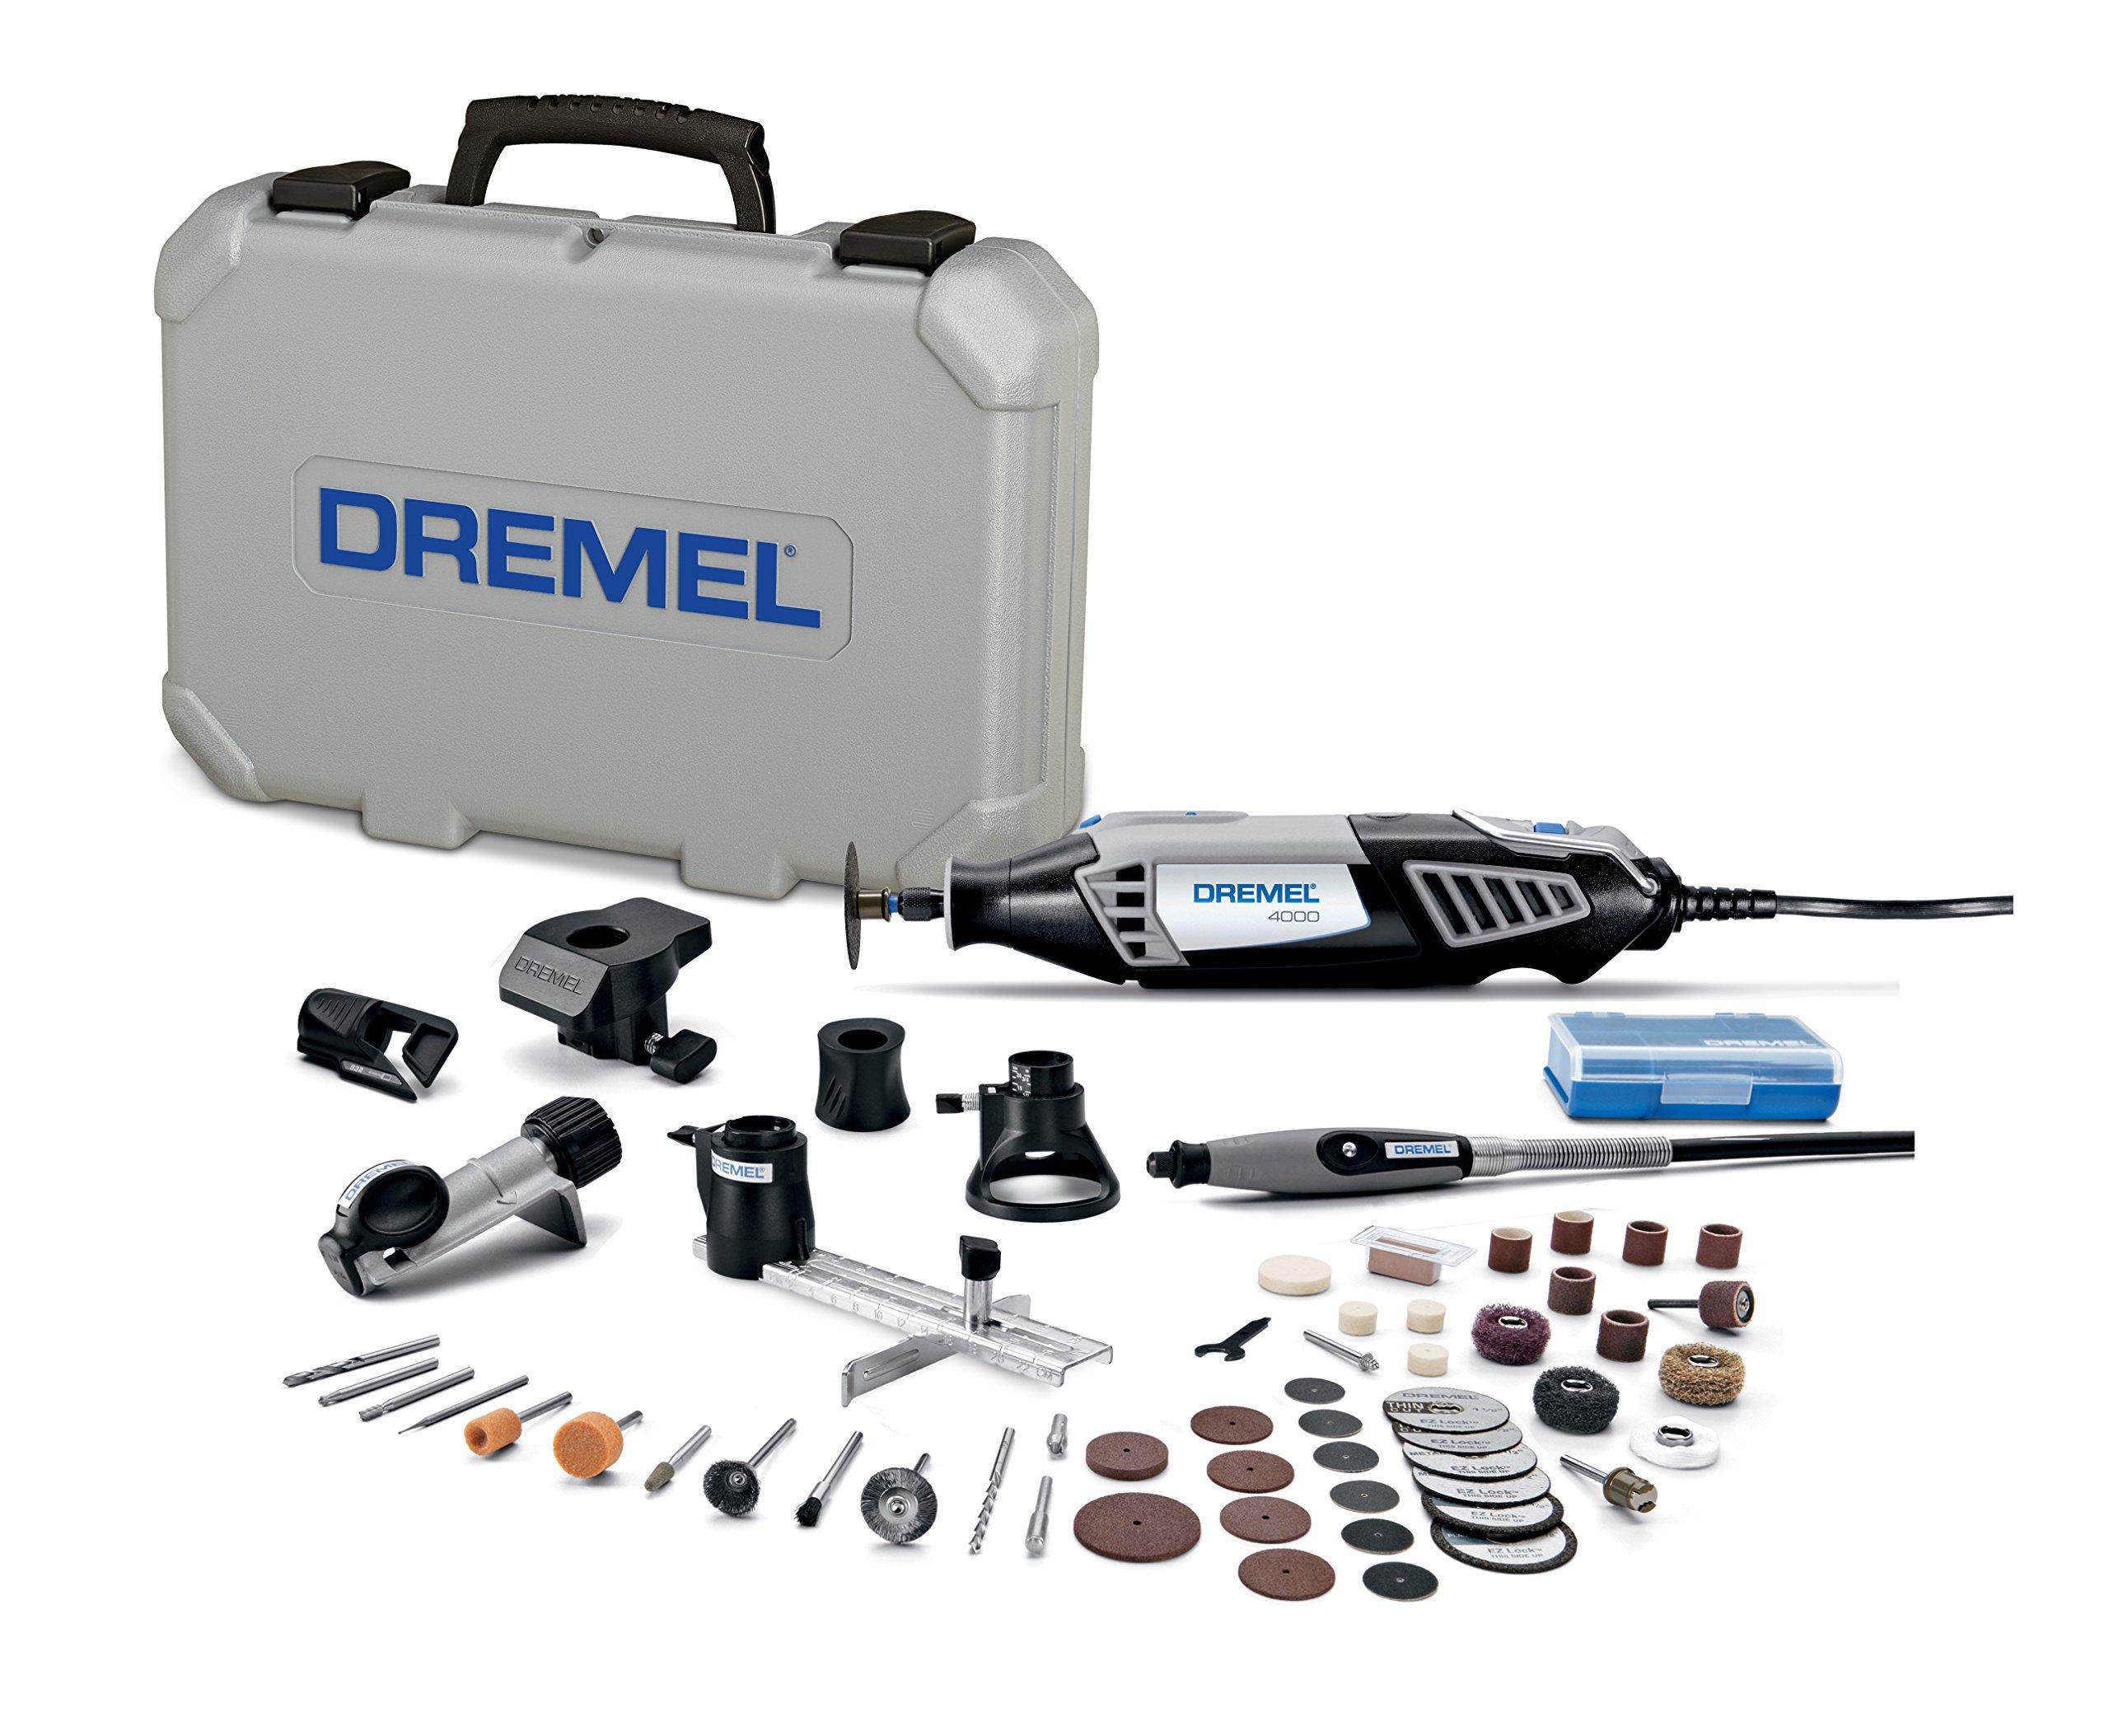 Dremel 4000-6/50-FF High Performance Rotary Tool Kit